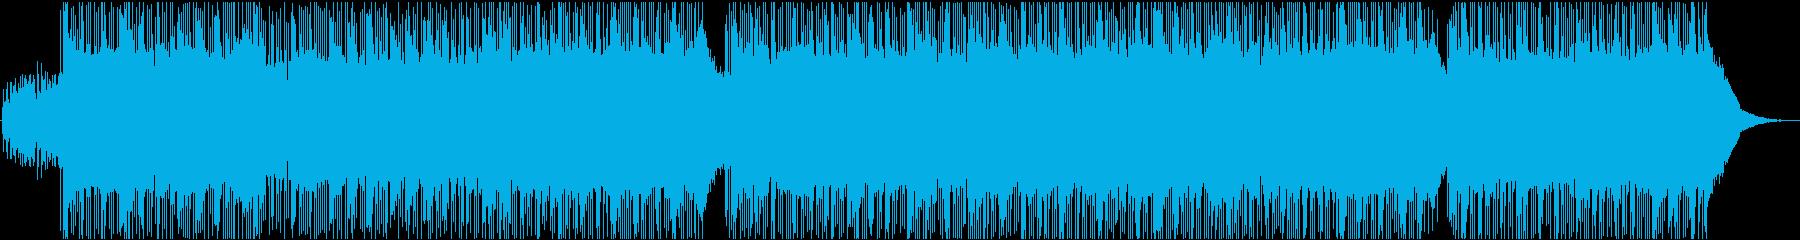 Rock, emotional, energetic's reproduced waveform